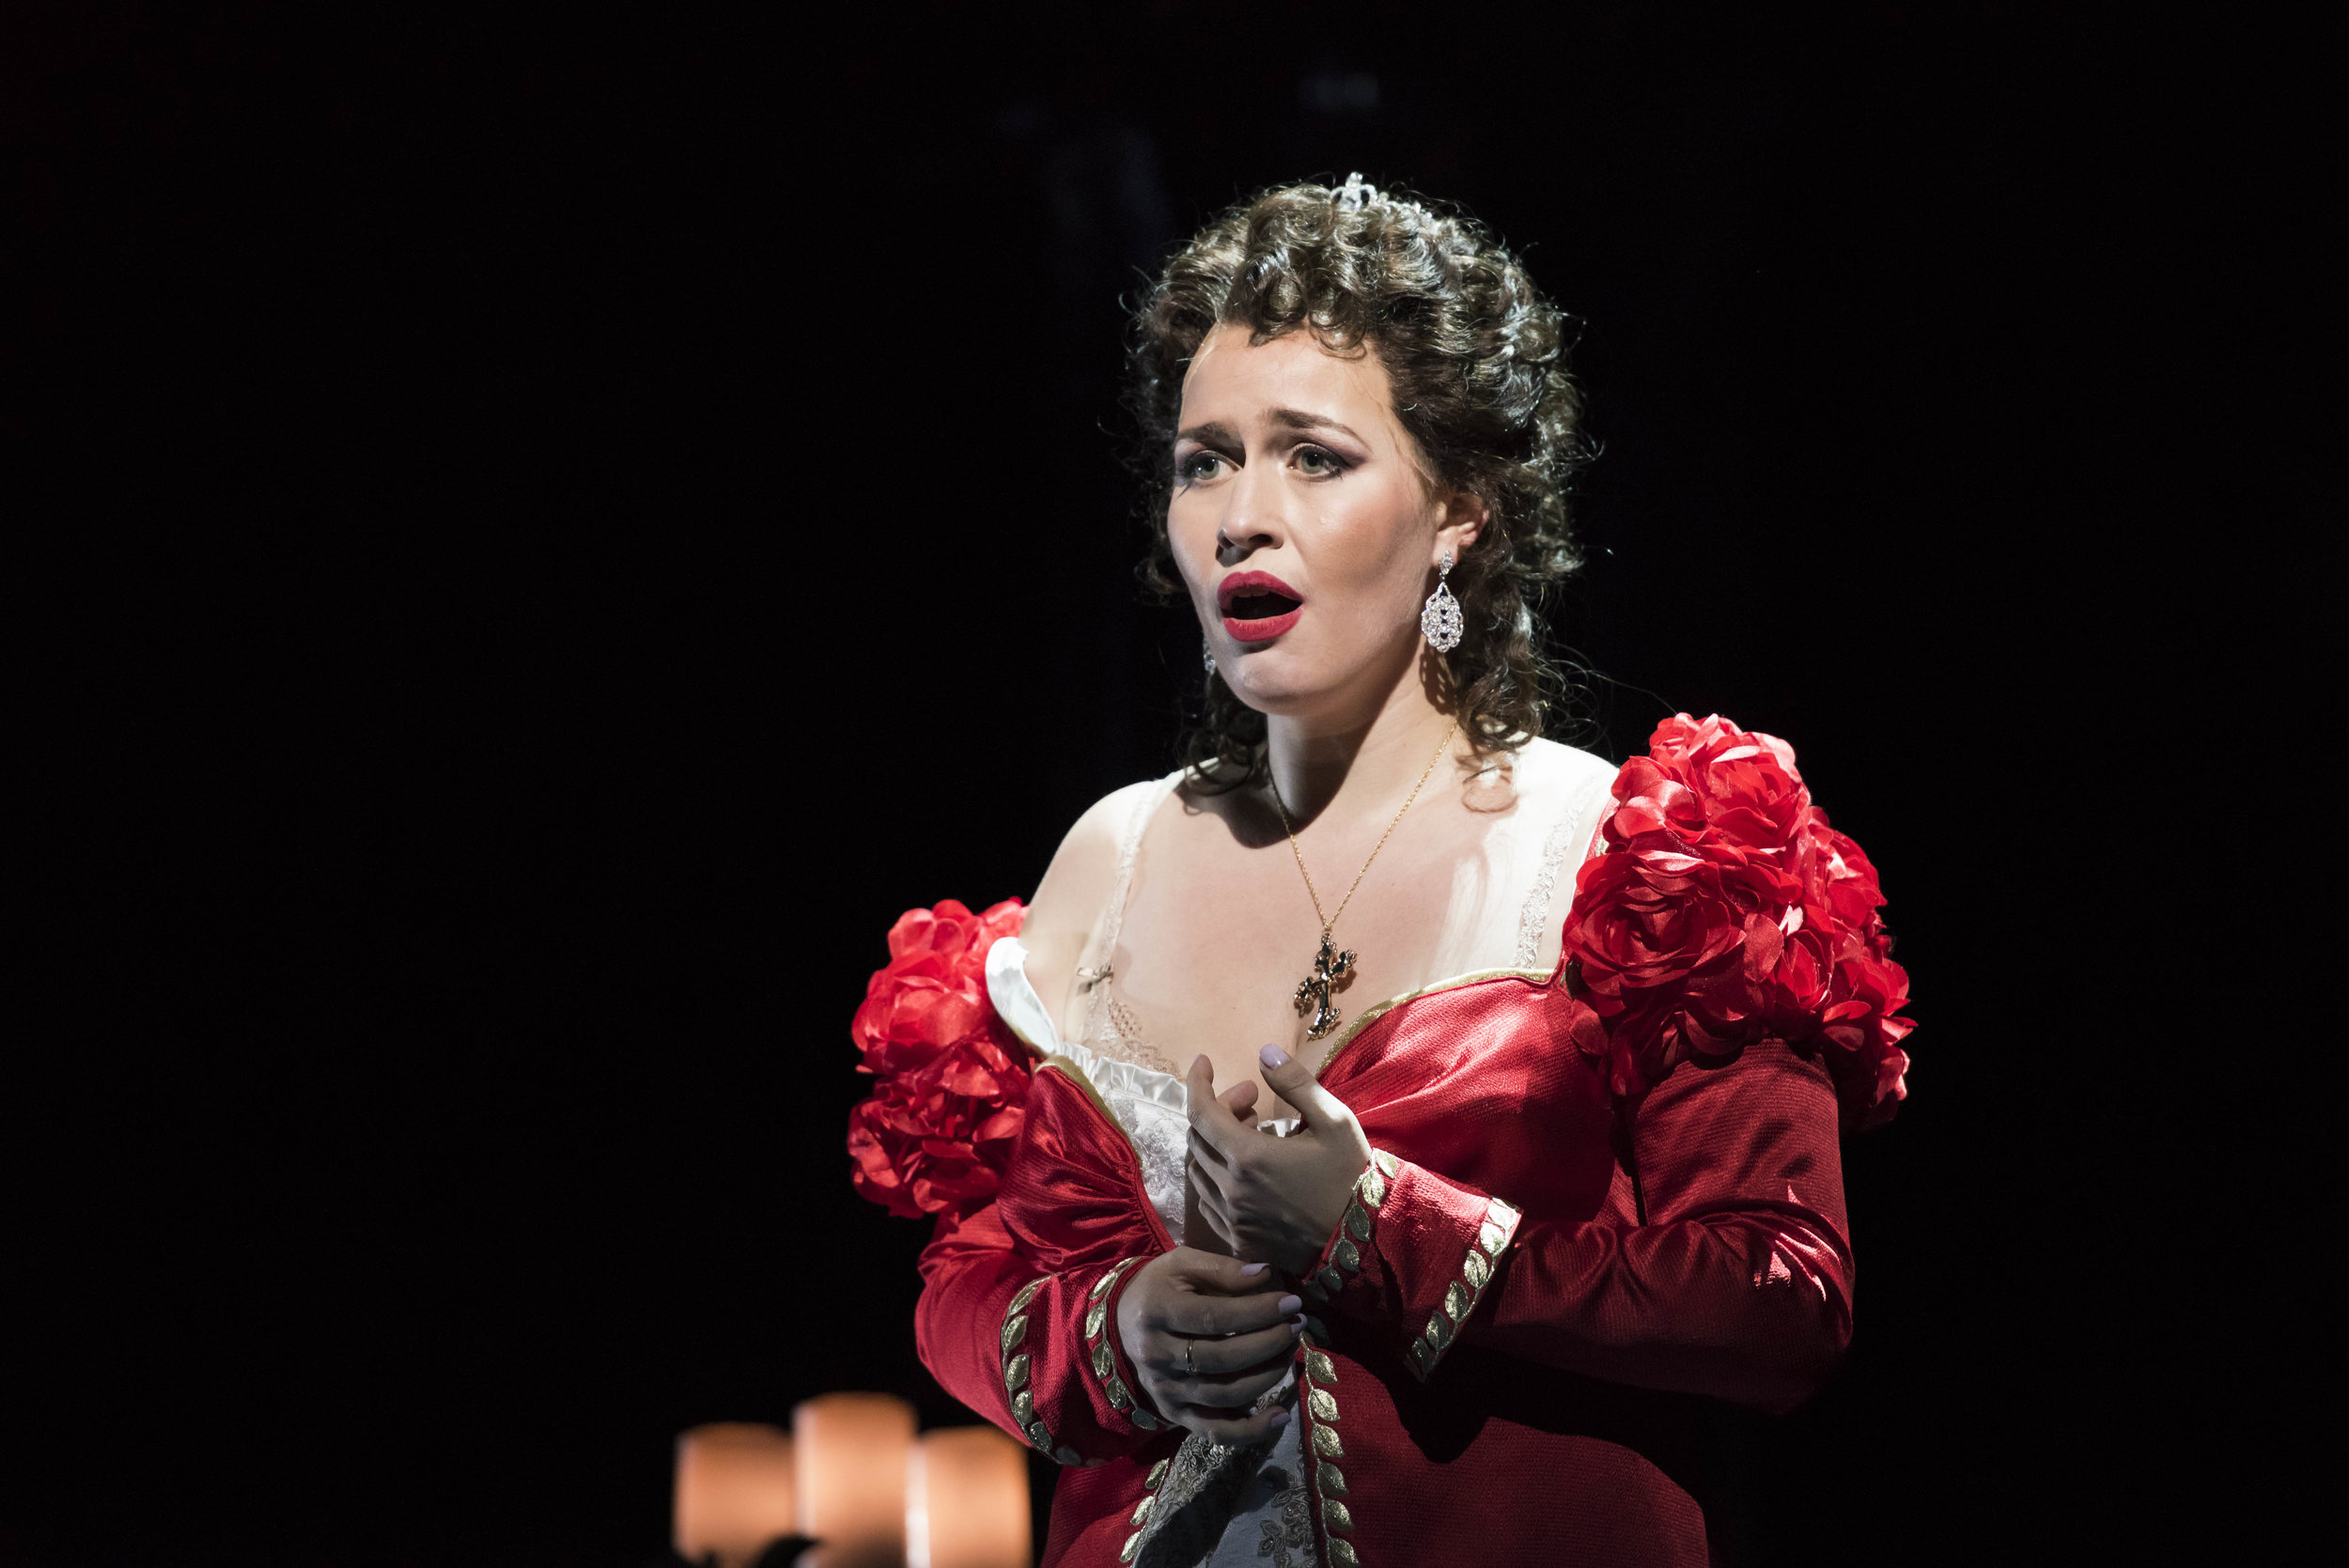 Soprano Elena Stikhina at Tosca in the Boston Lyric Opera production at the Emerson Majestic Theater, Oct. 13, 2017. Liza Voll photograph